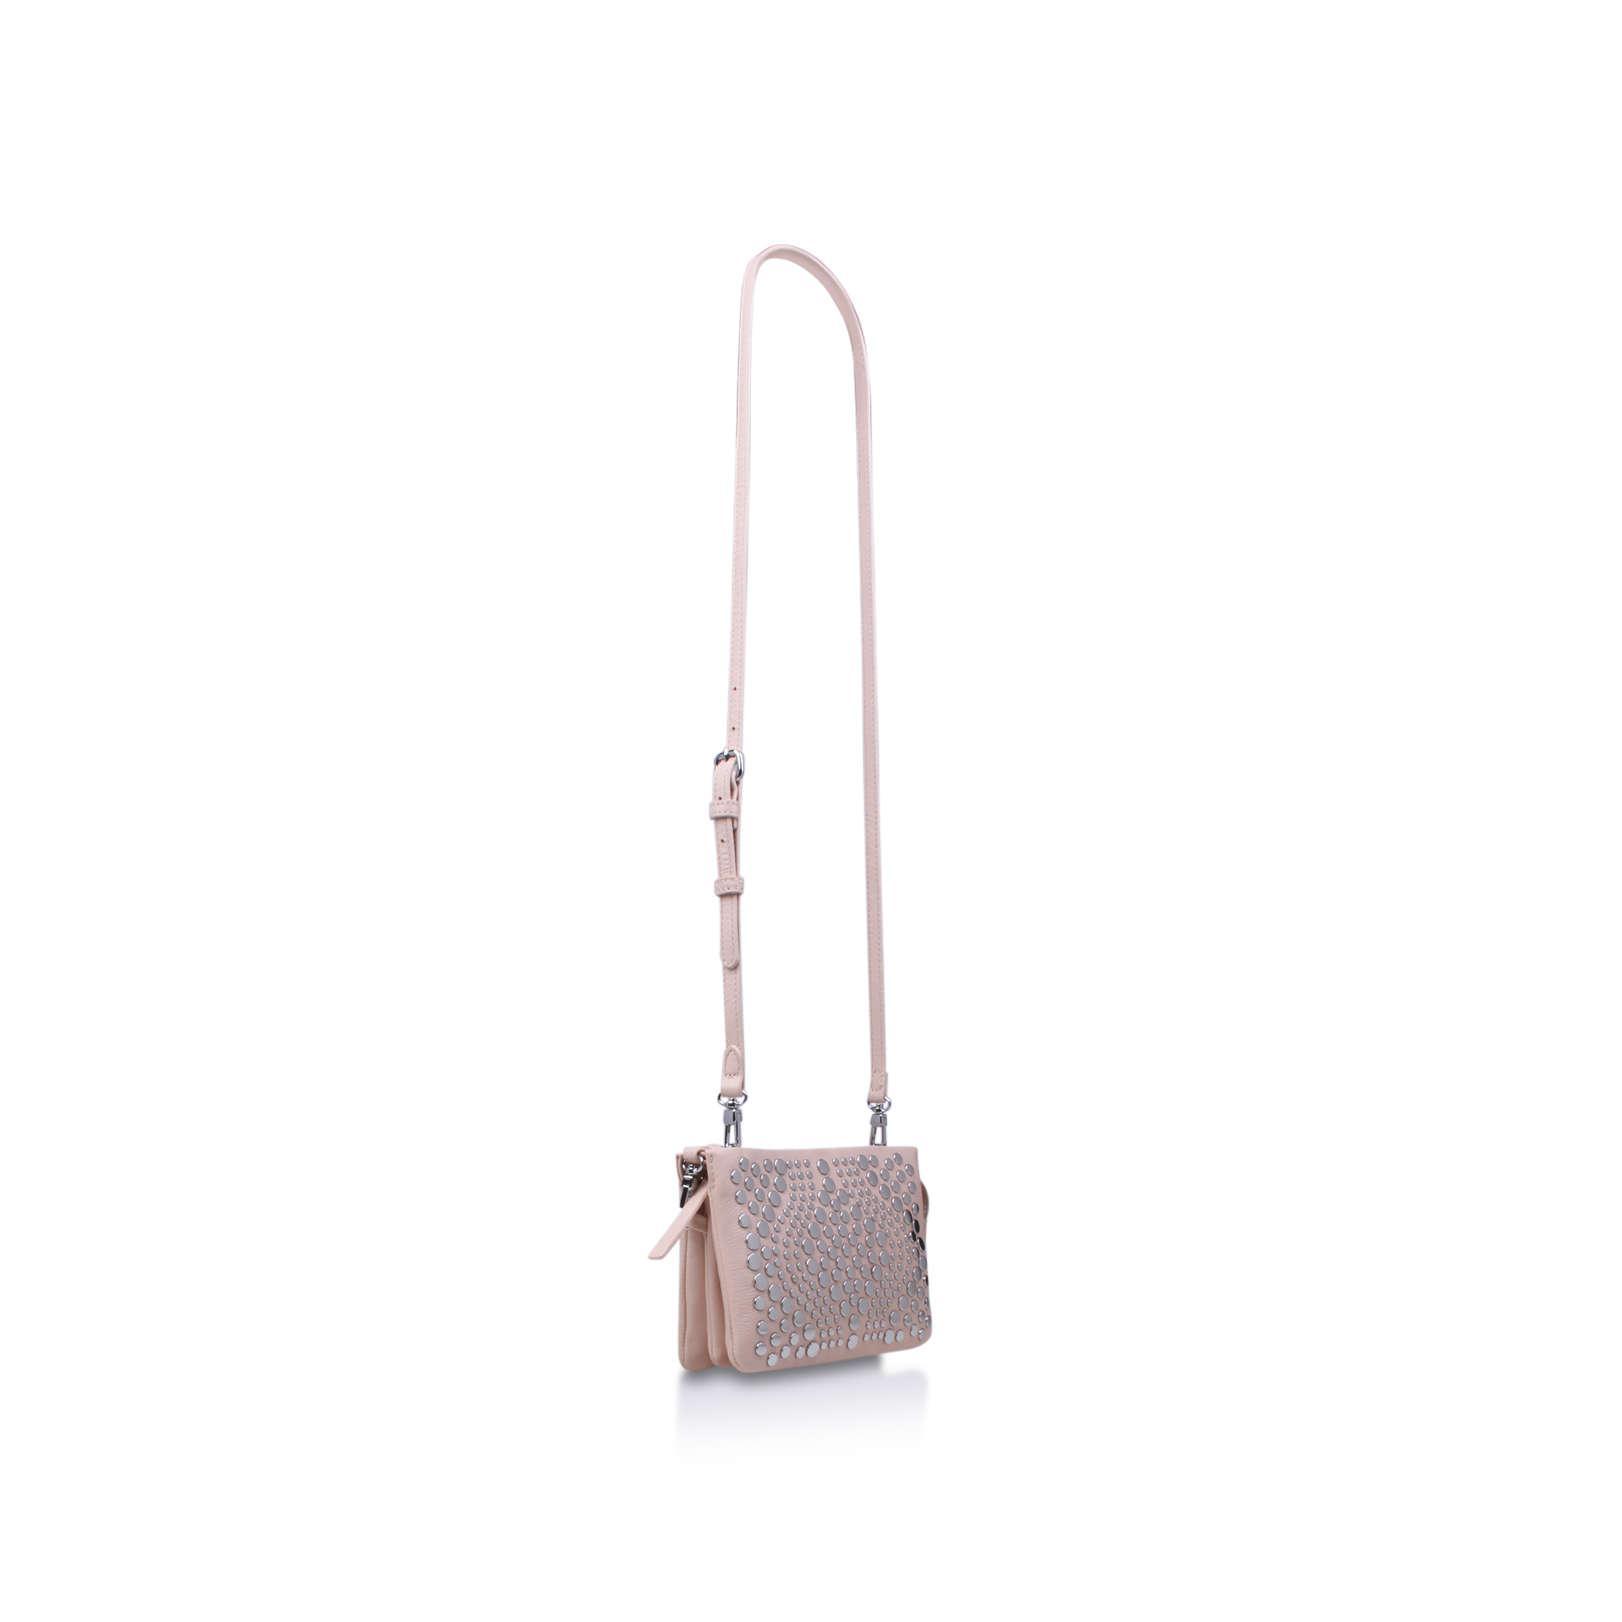 Vince Camuto Bonny Small Crossbody Pale Pink Leather Handbag